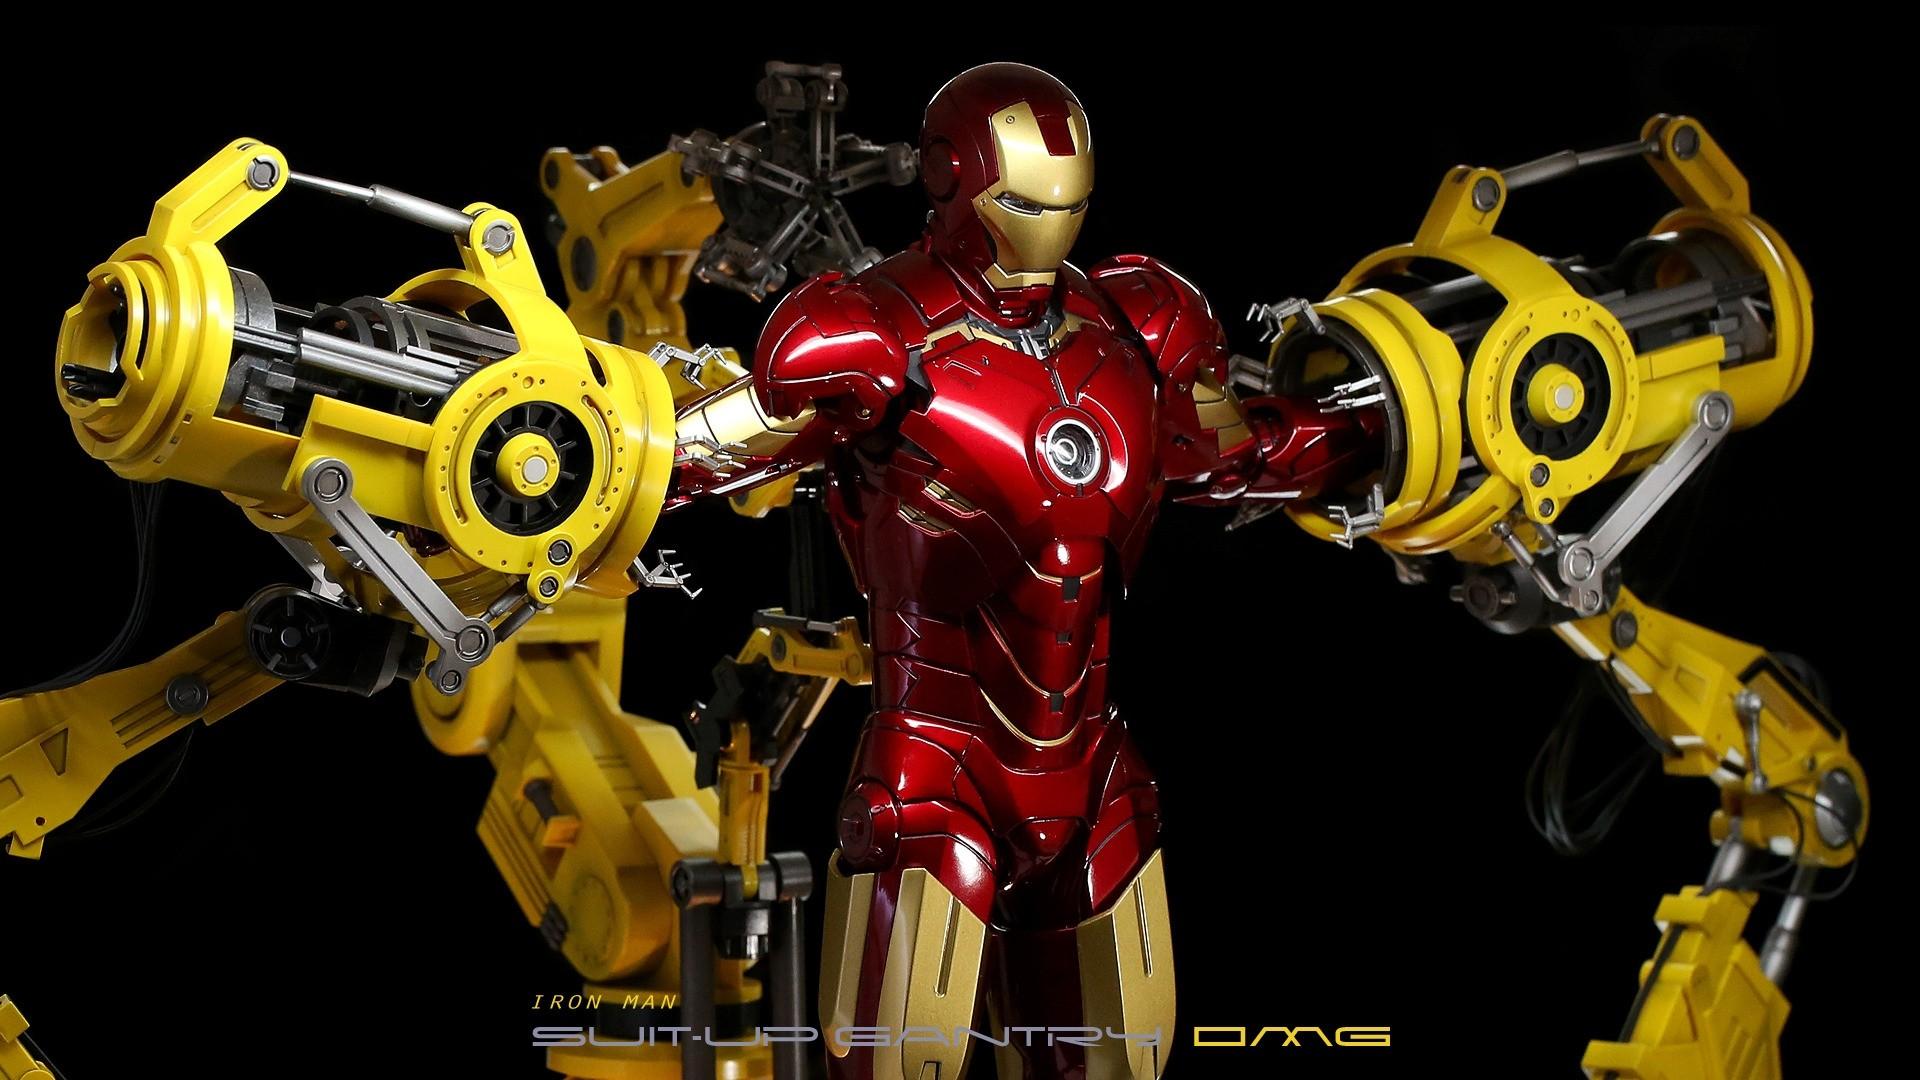 General 1920x1080 Iron Man toys action figures